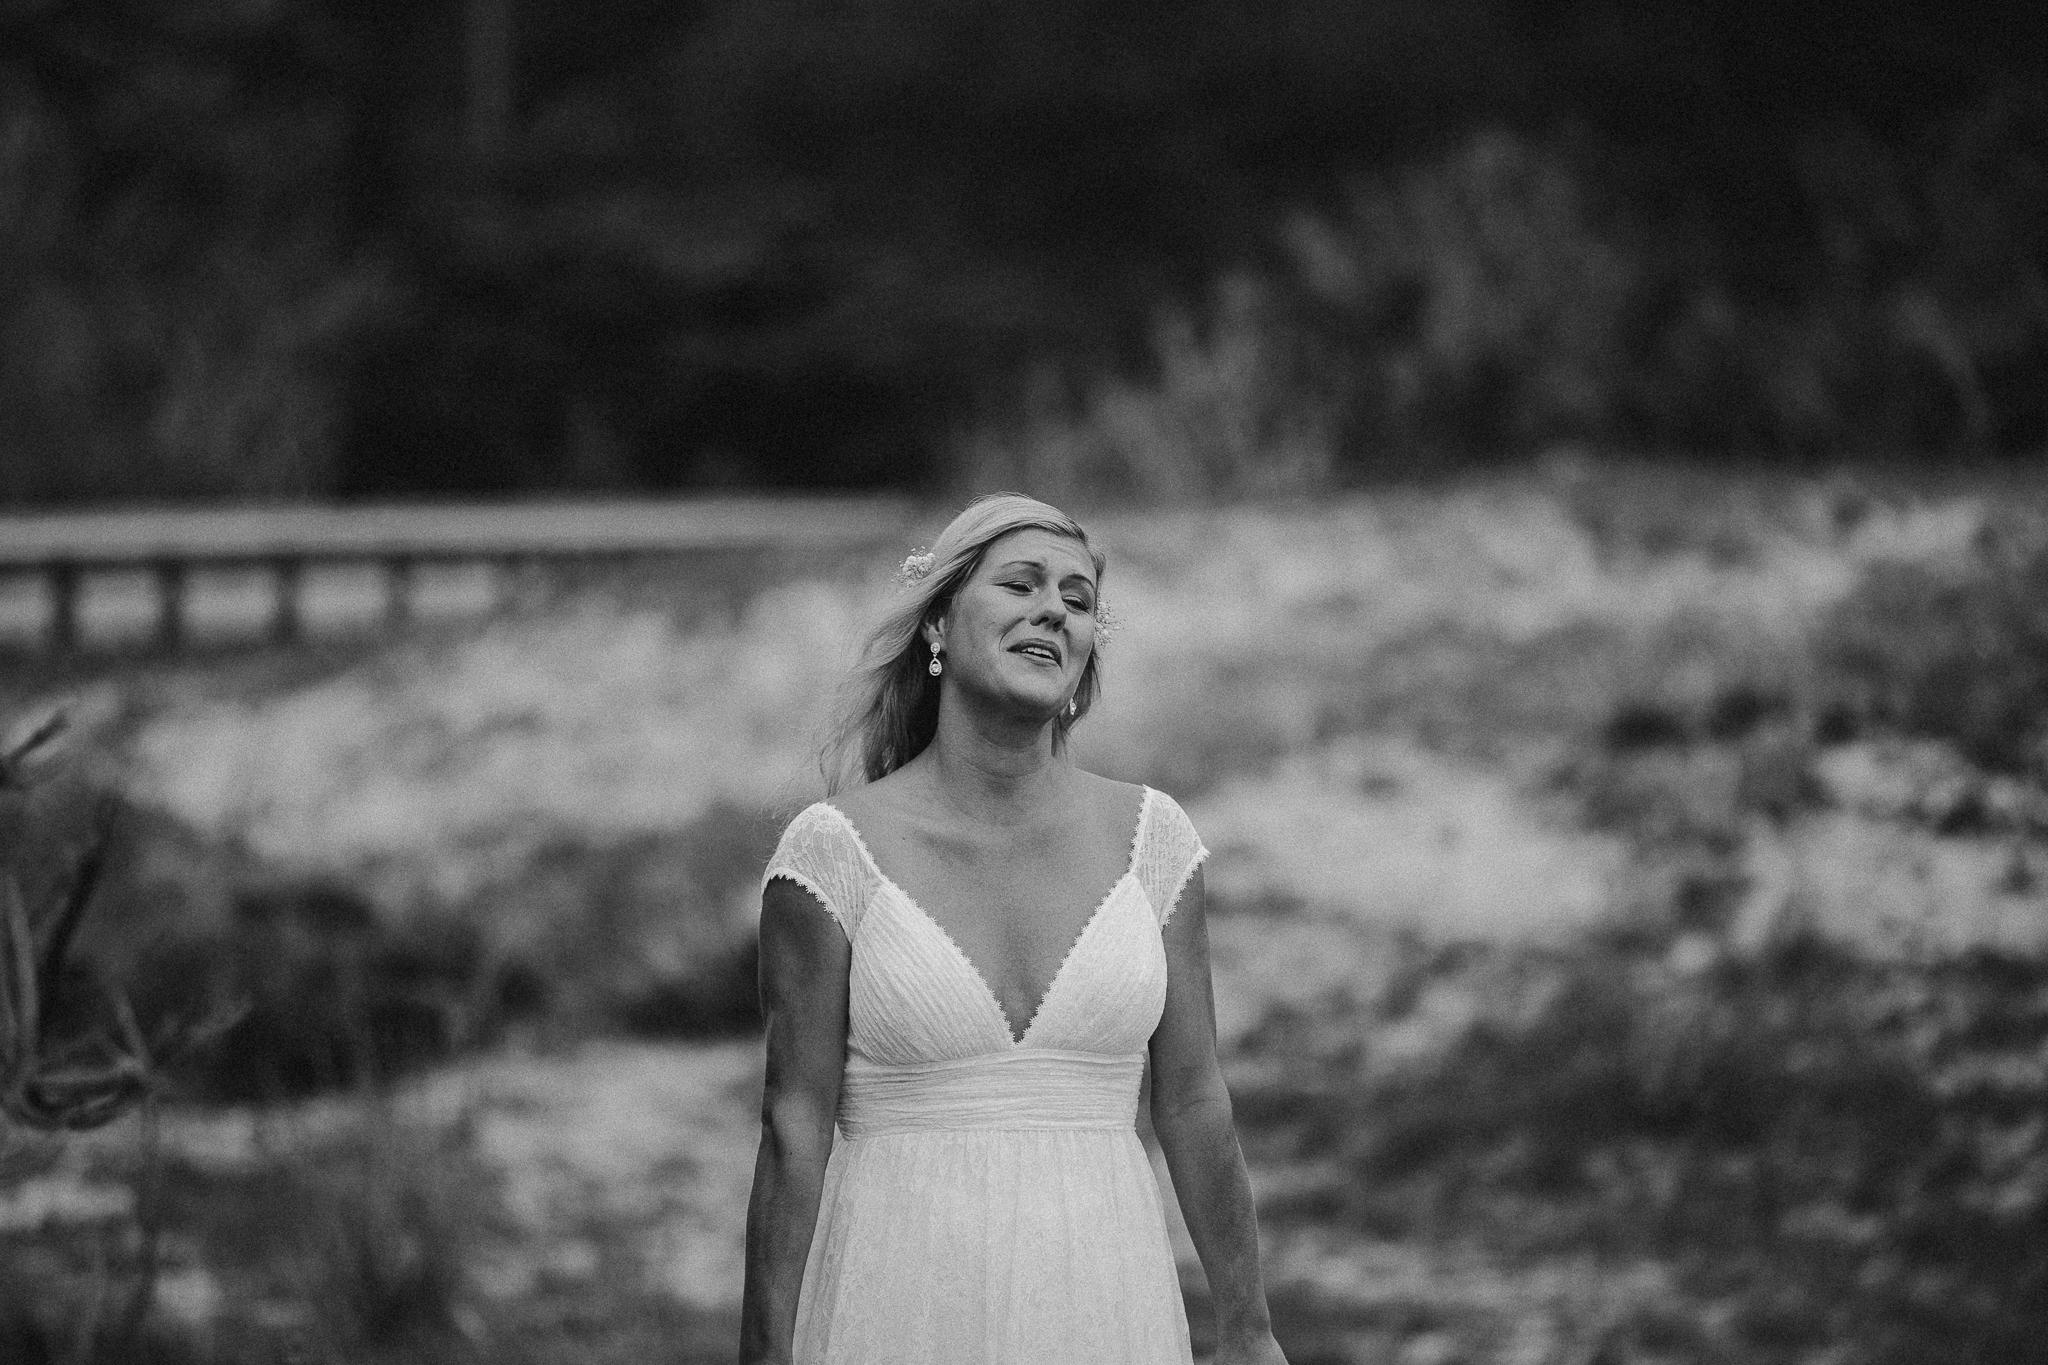 Archer_Inspired_Photography_Pacific_Grove_Ansilomar_Beach_Carmel_Valley_Wedding-29.jpg